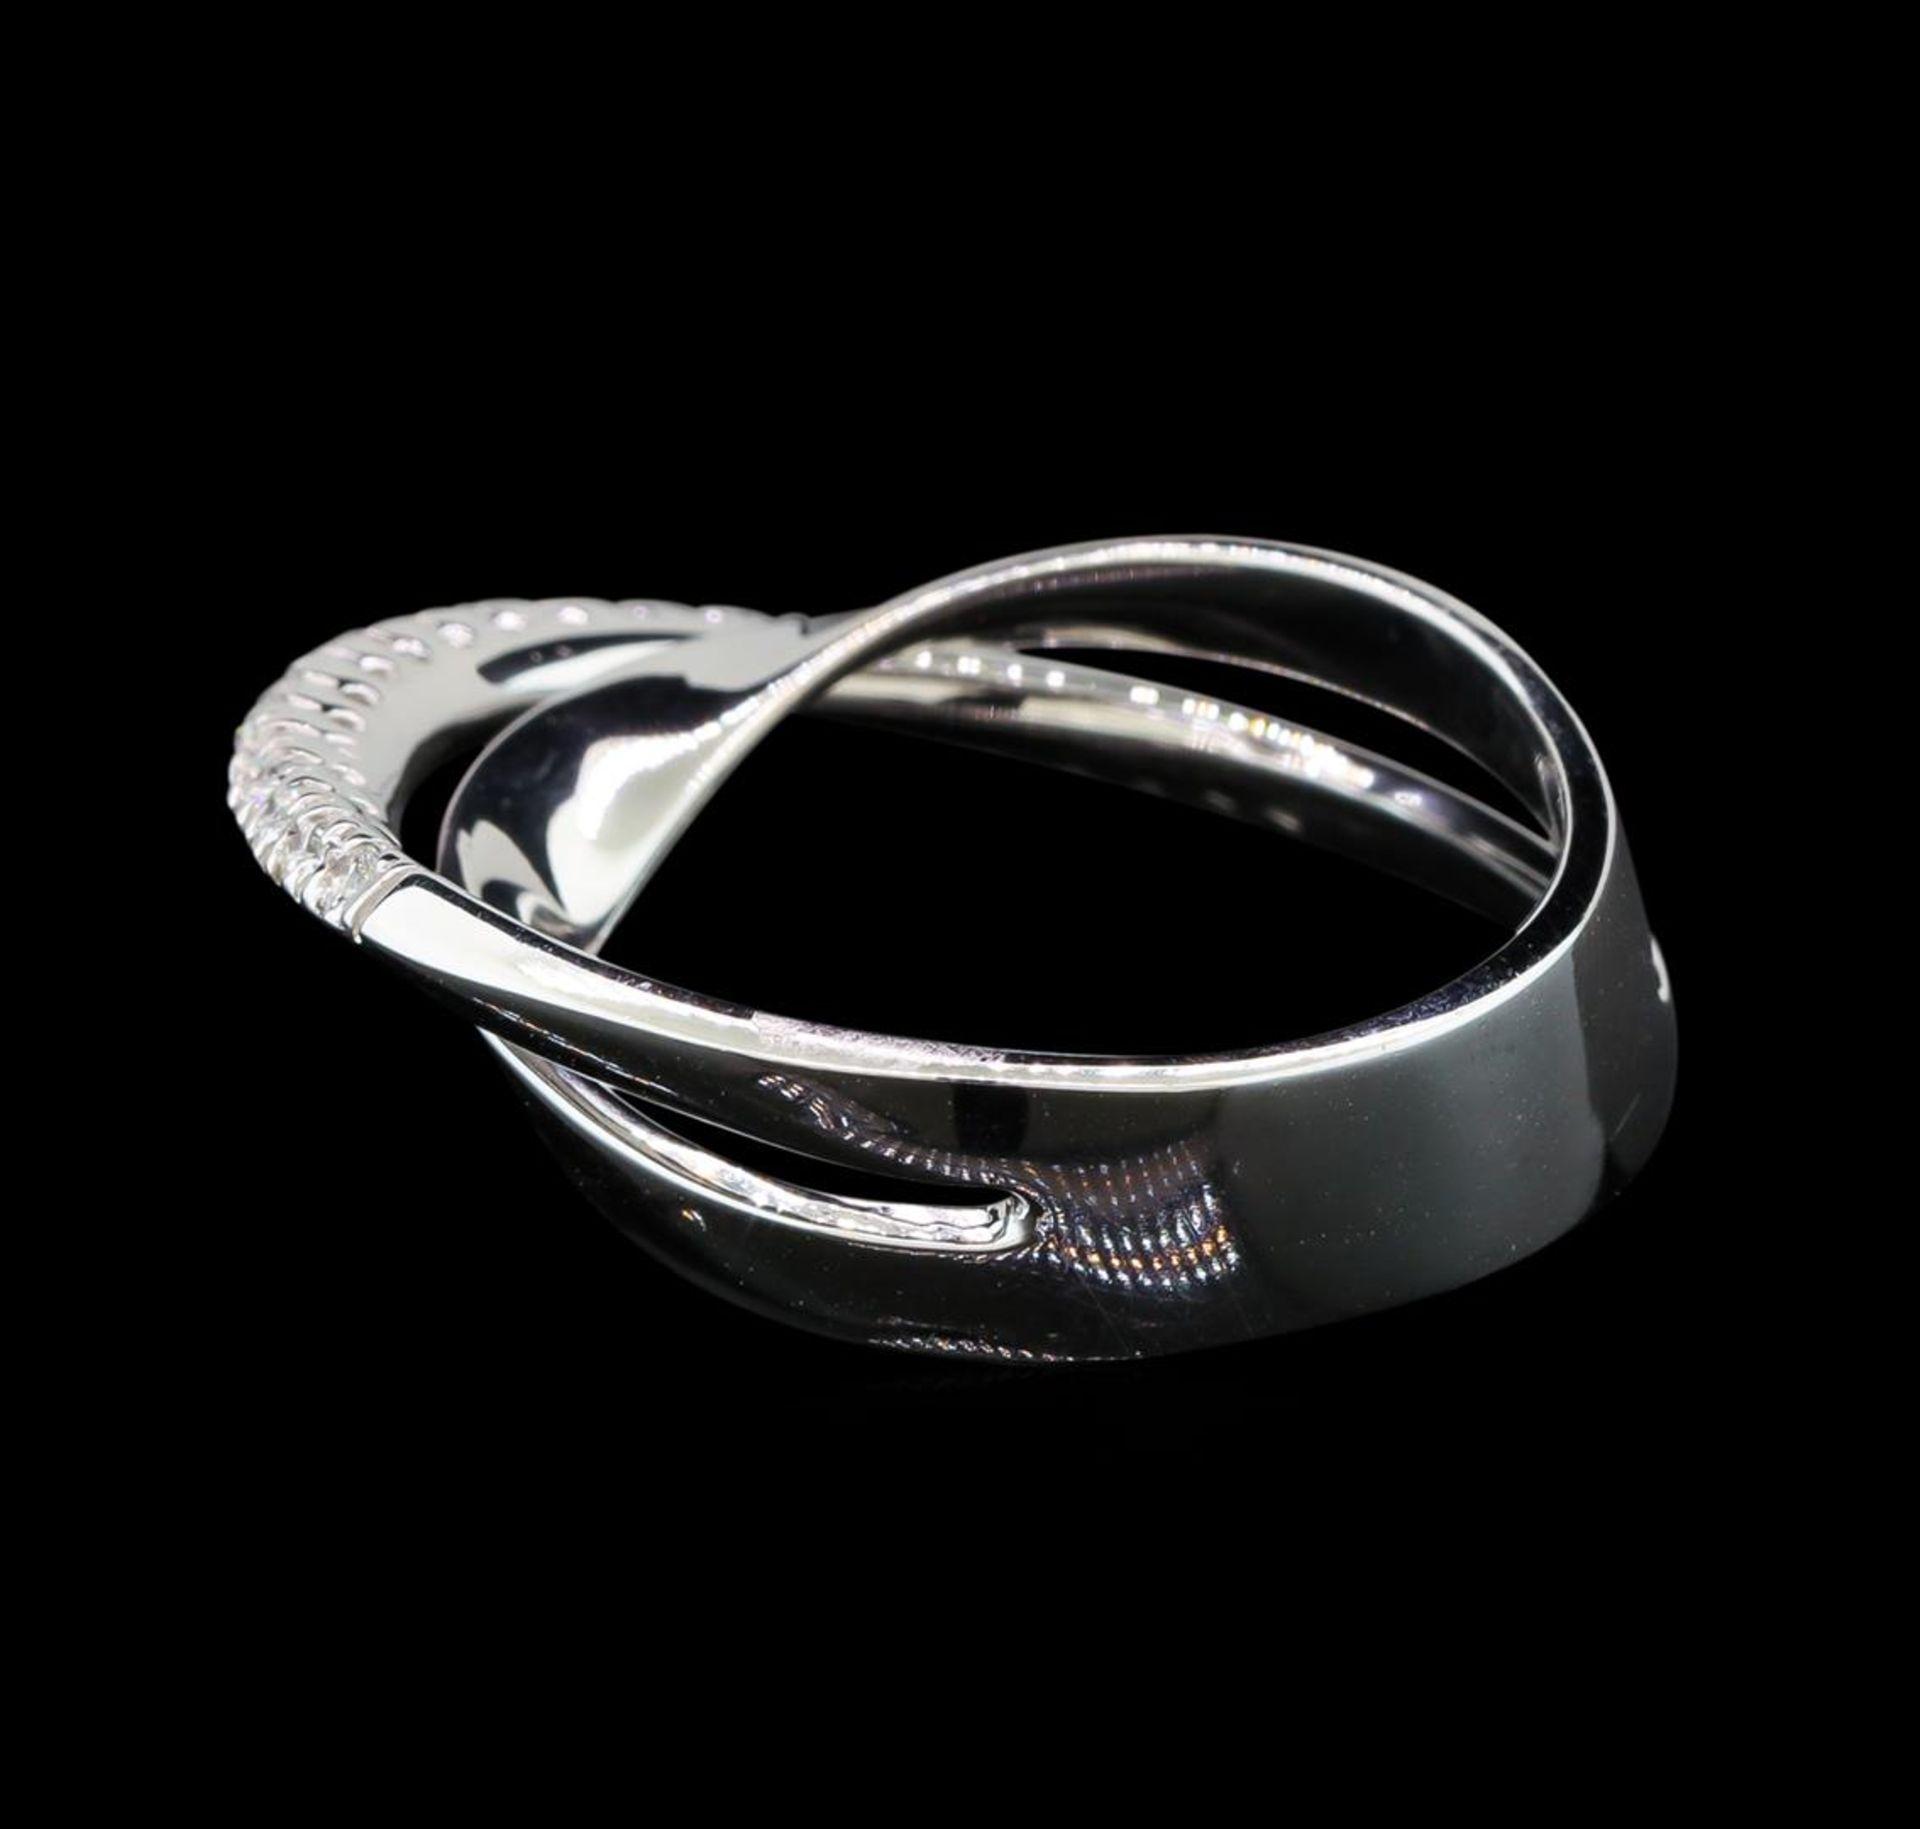 0.25 ctw Diamond Ring - 14KT White Gold - Image 2 of 3